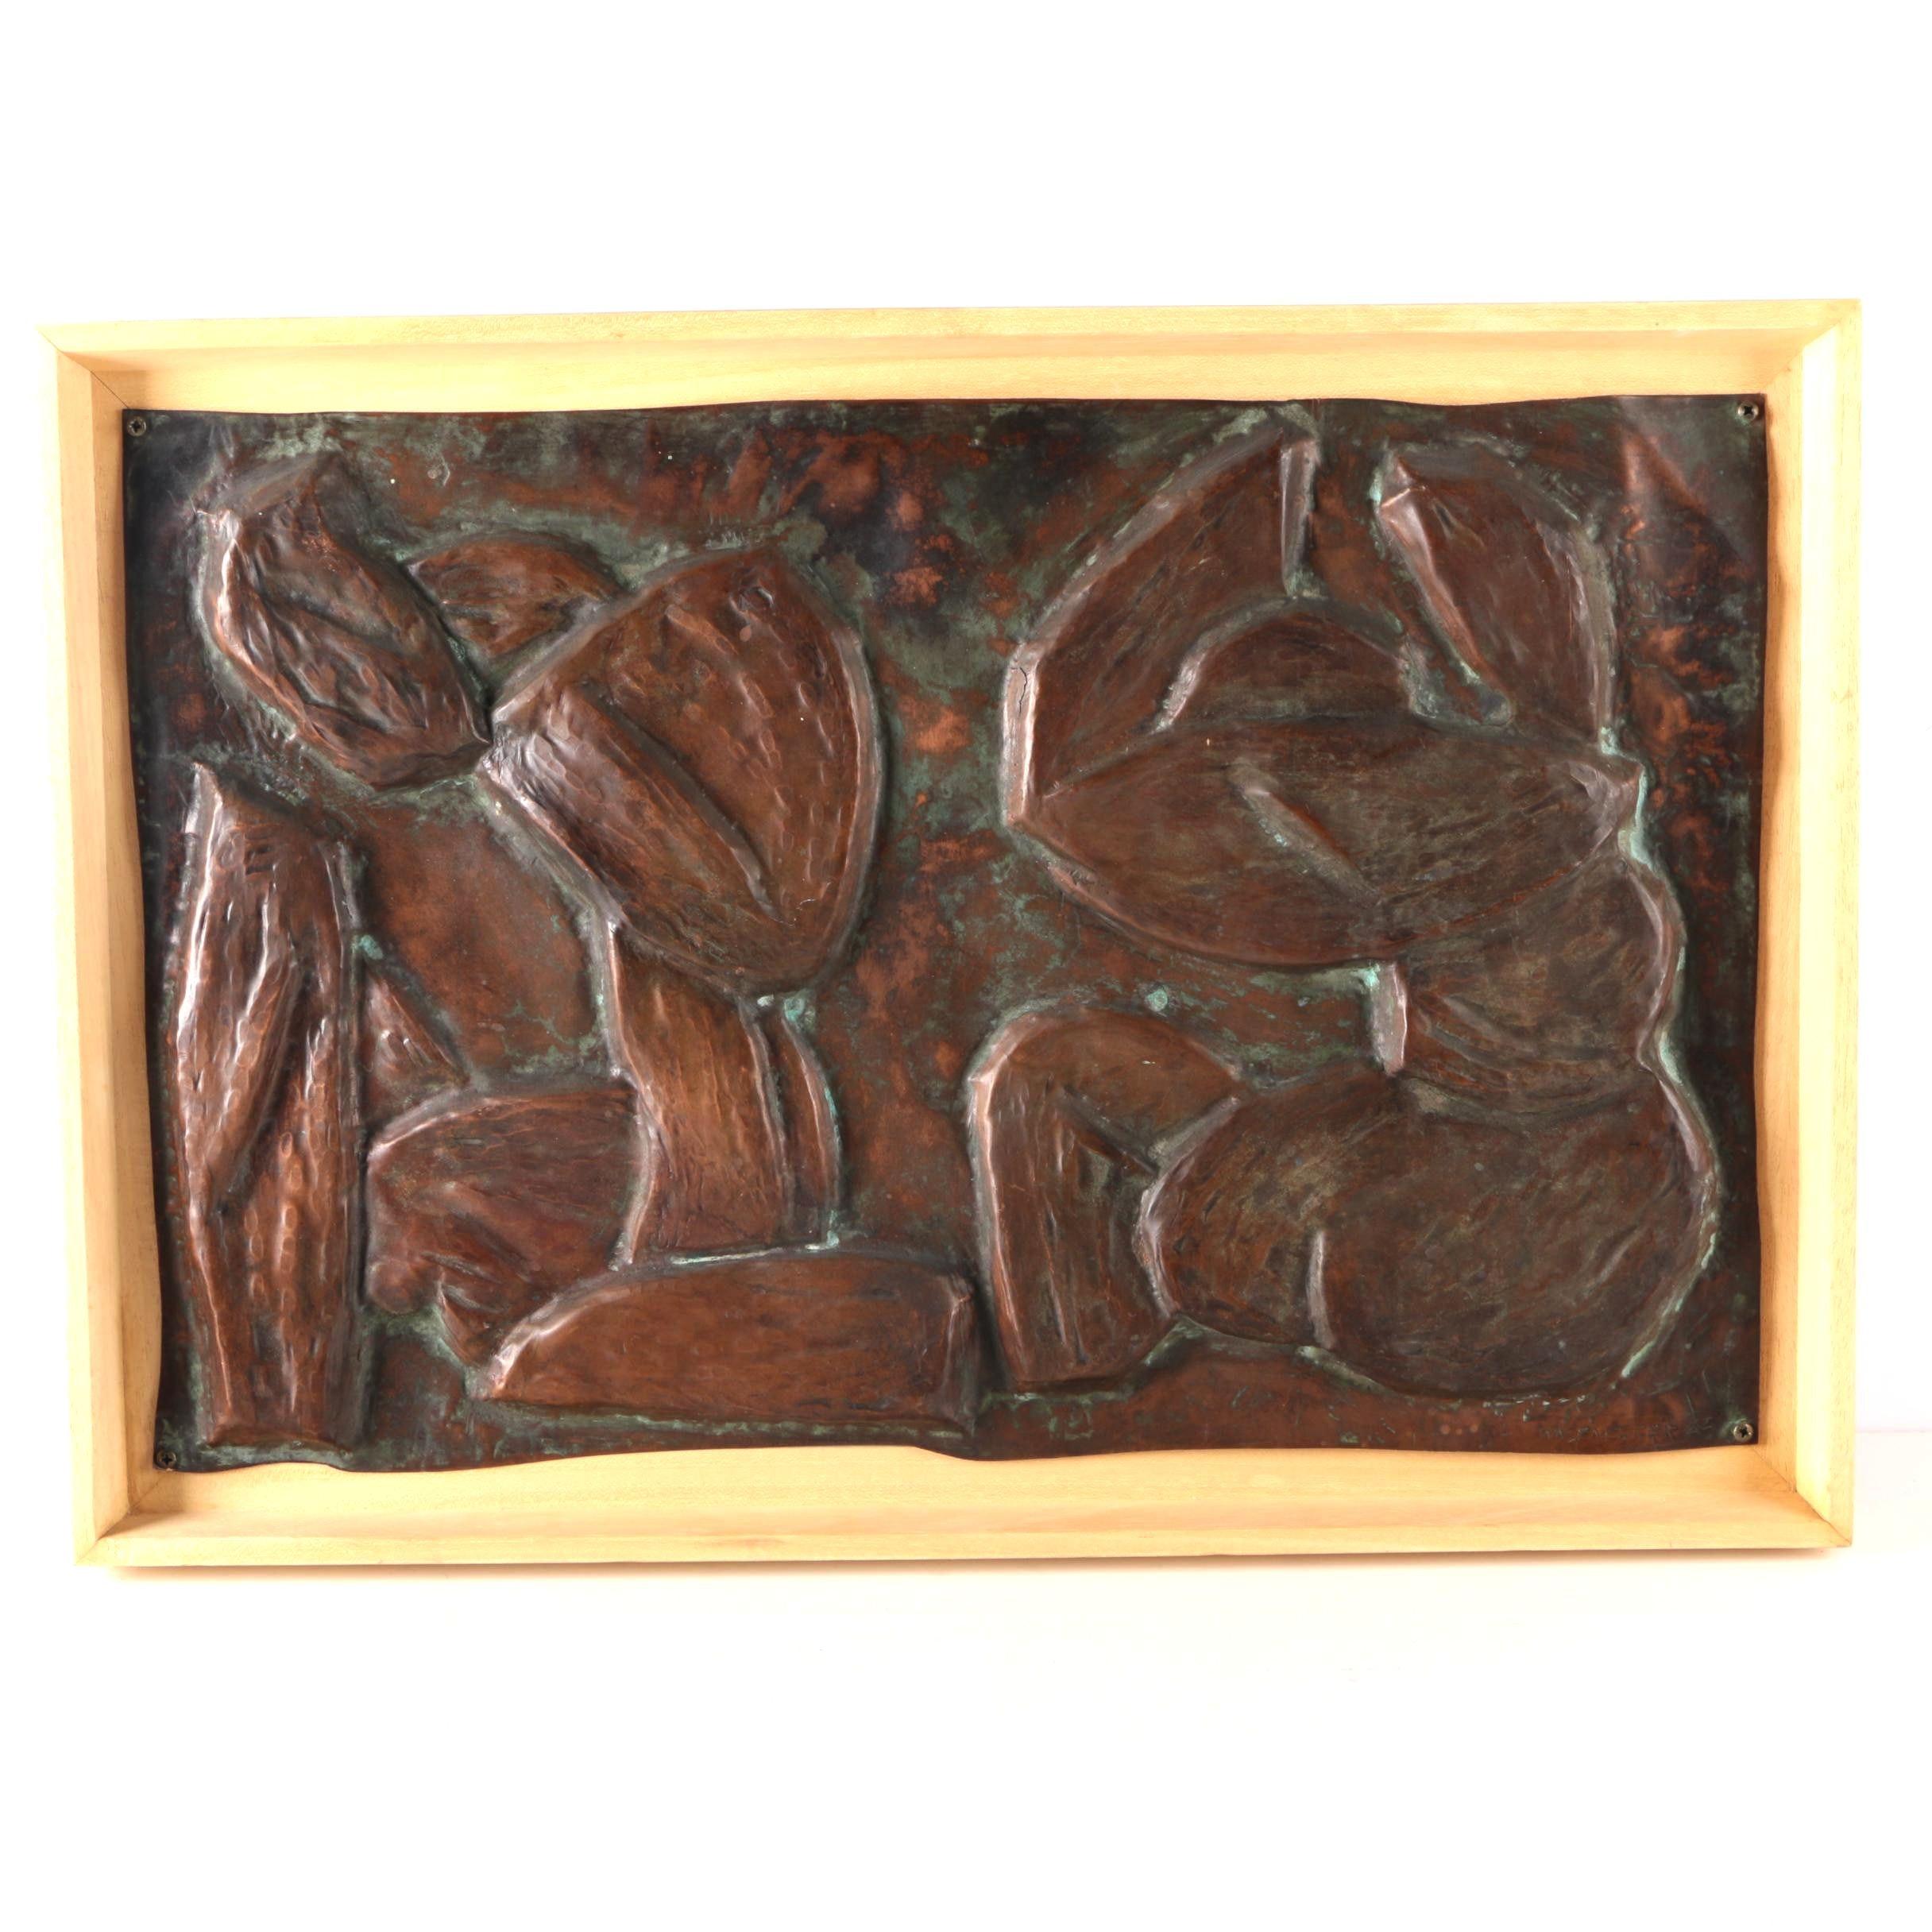 1967 Wazenegger Hammered Copper Relief